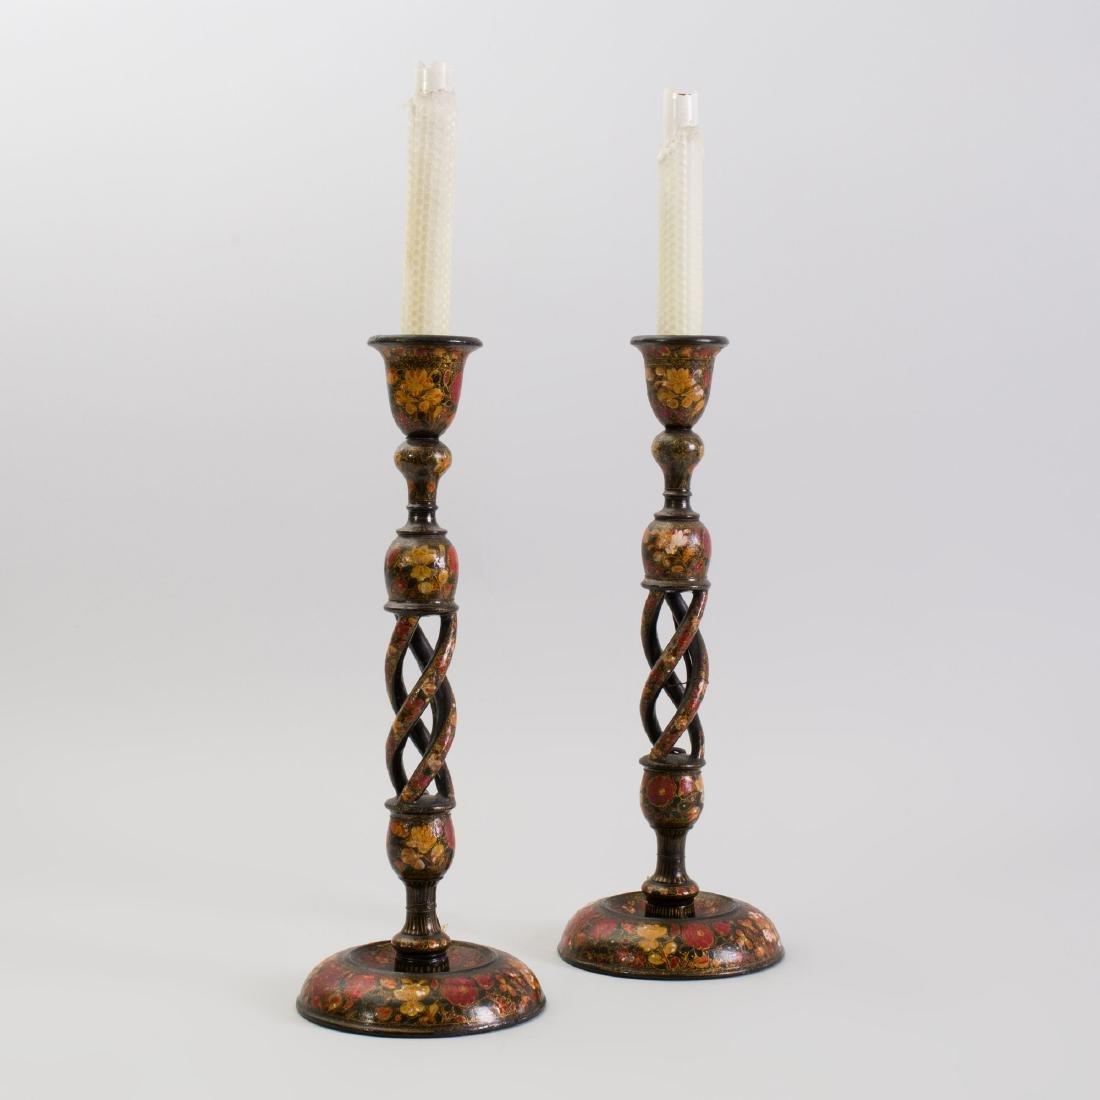 Pair of Kashmir Lacquer Candlesticks